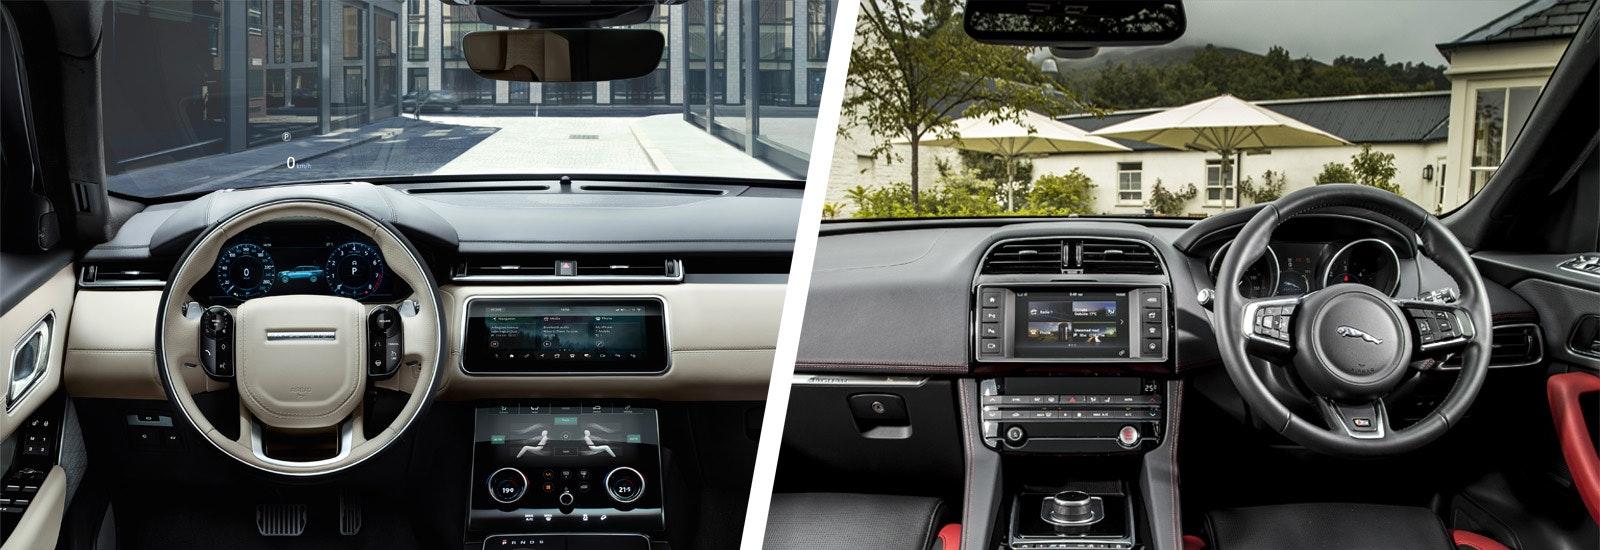 Range Rover Velar Vs Jaguar F Pace Interior